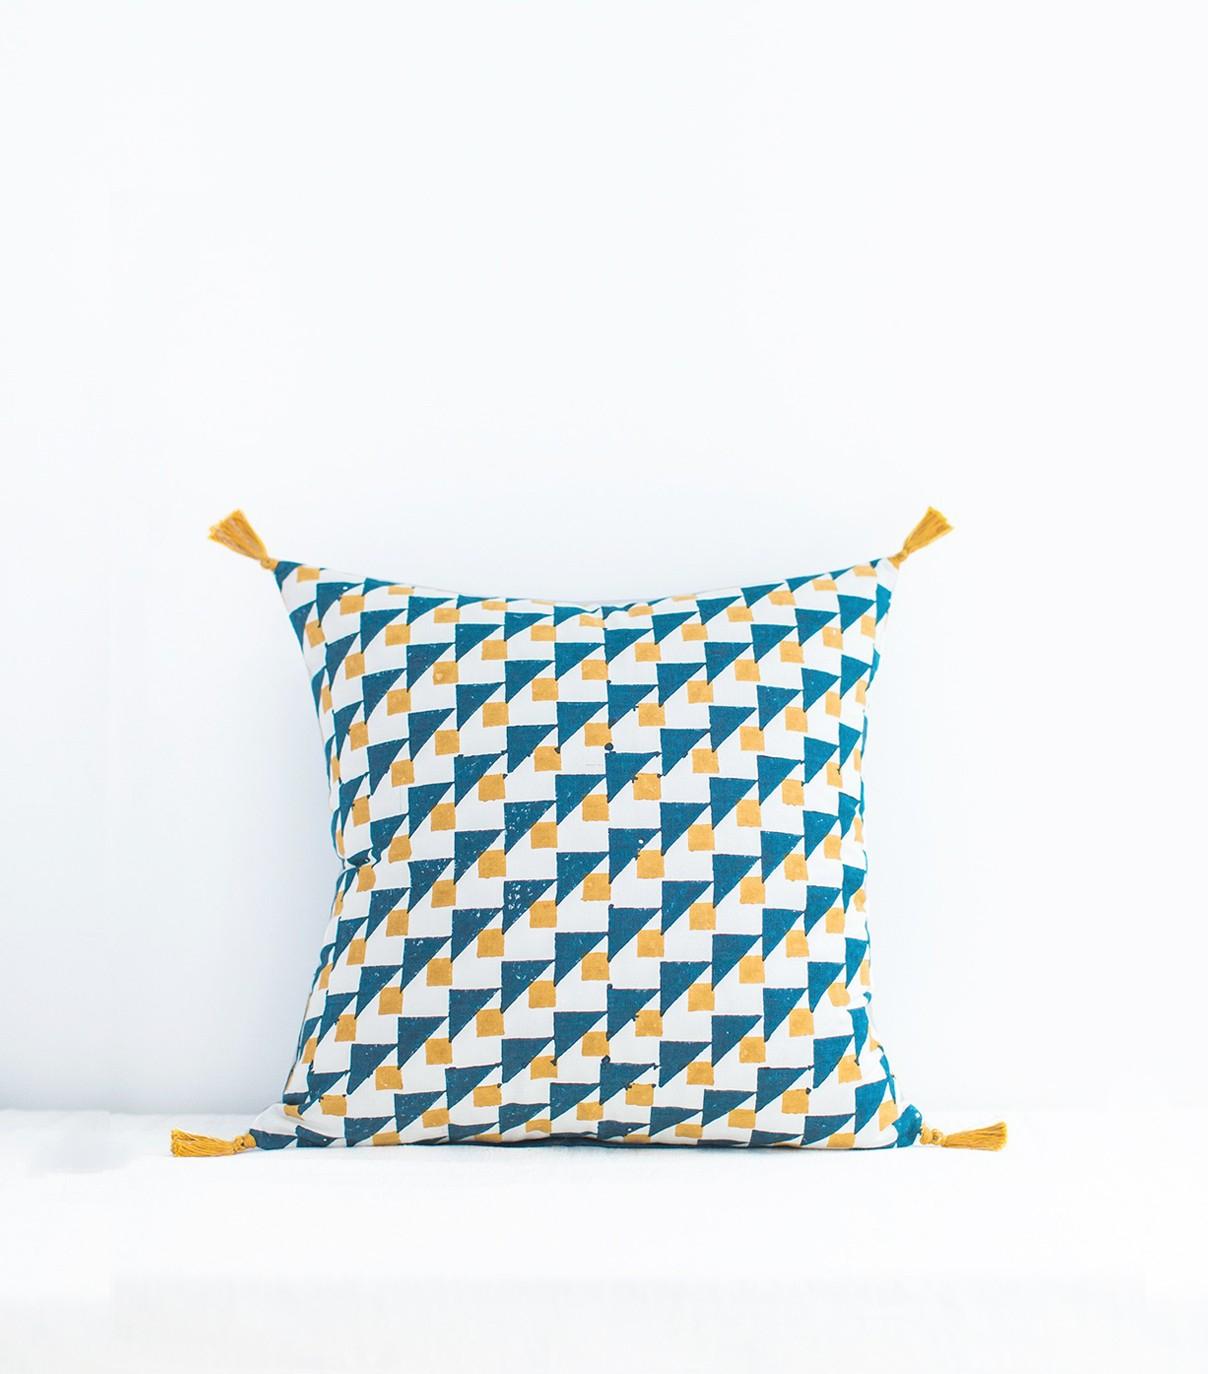 Coussin Bleu Canard Et Jaune Coussin In N Bleu Indigo Et Jaune Moutarde 40x40 Cm